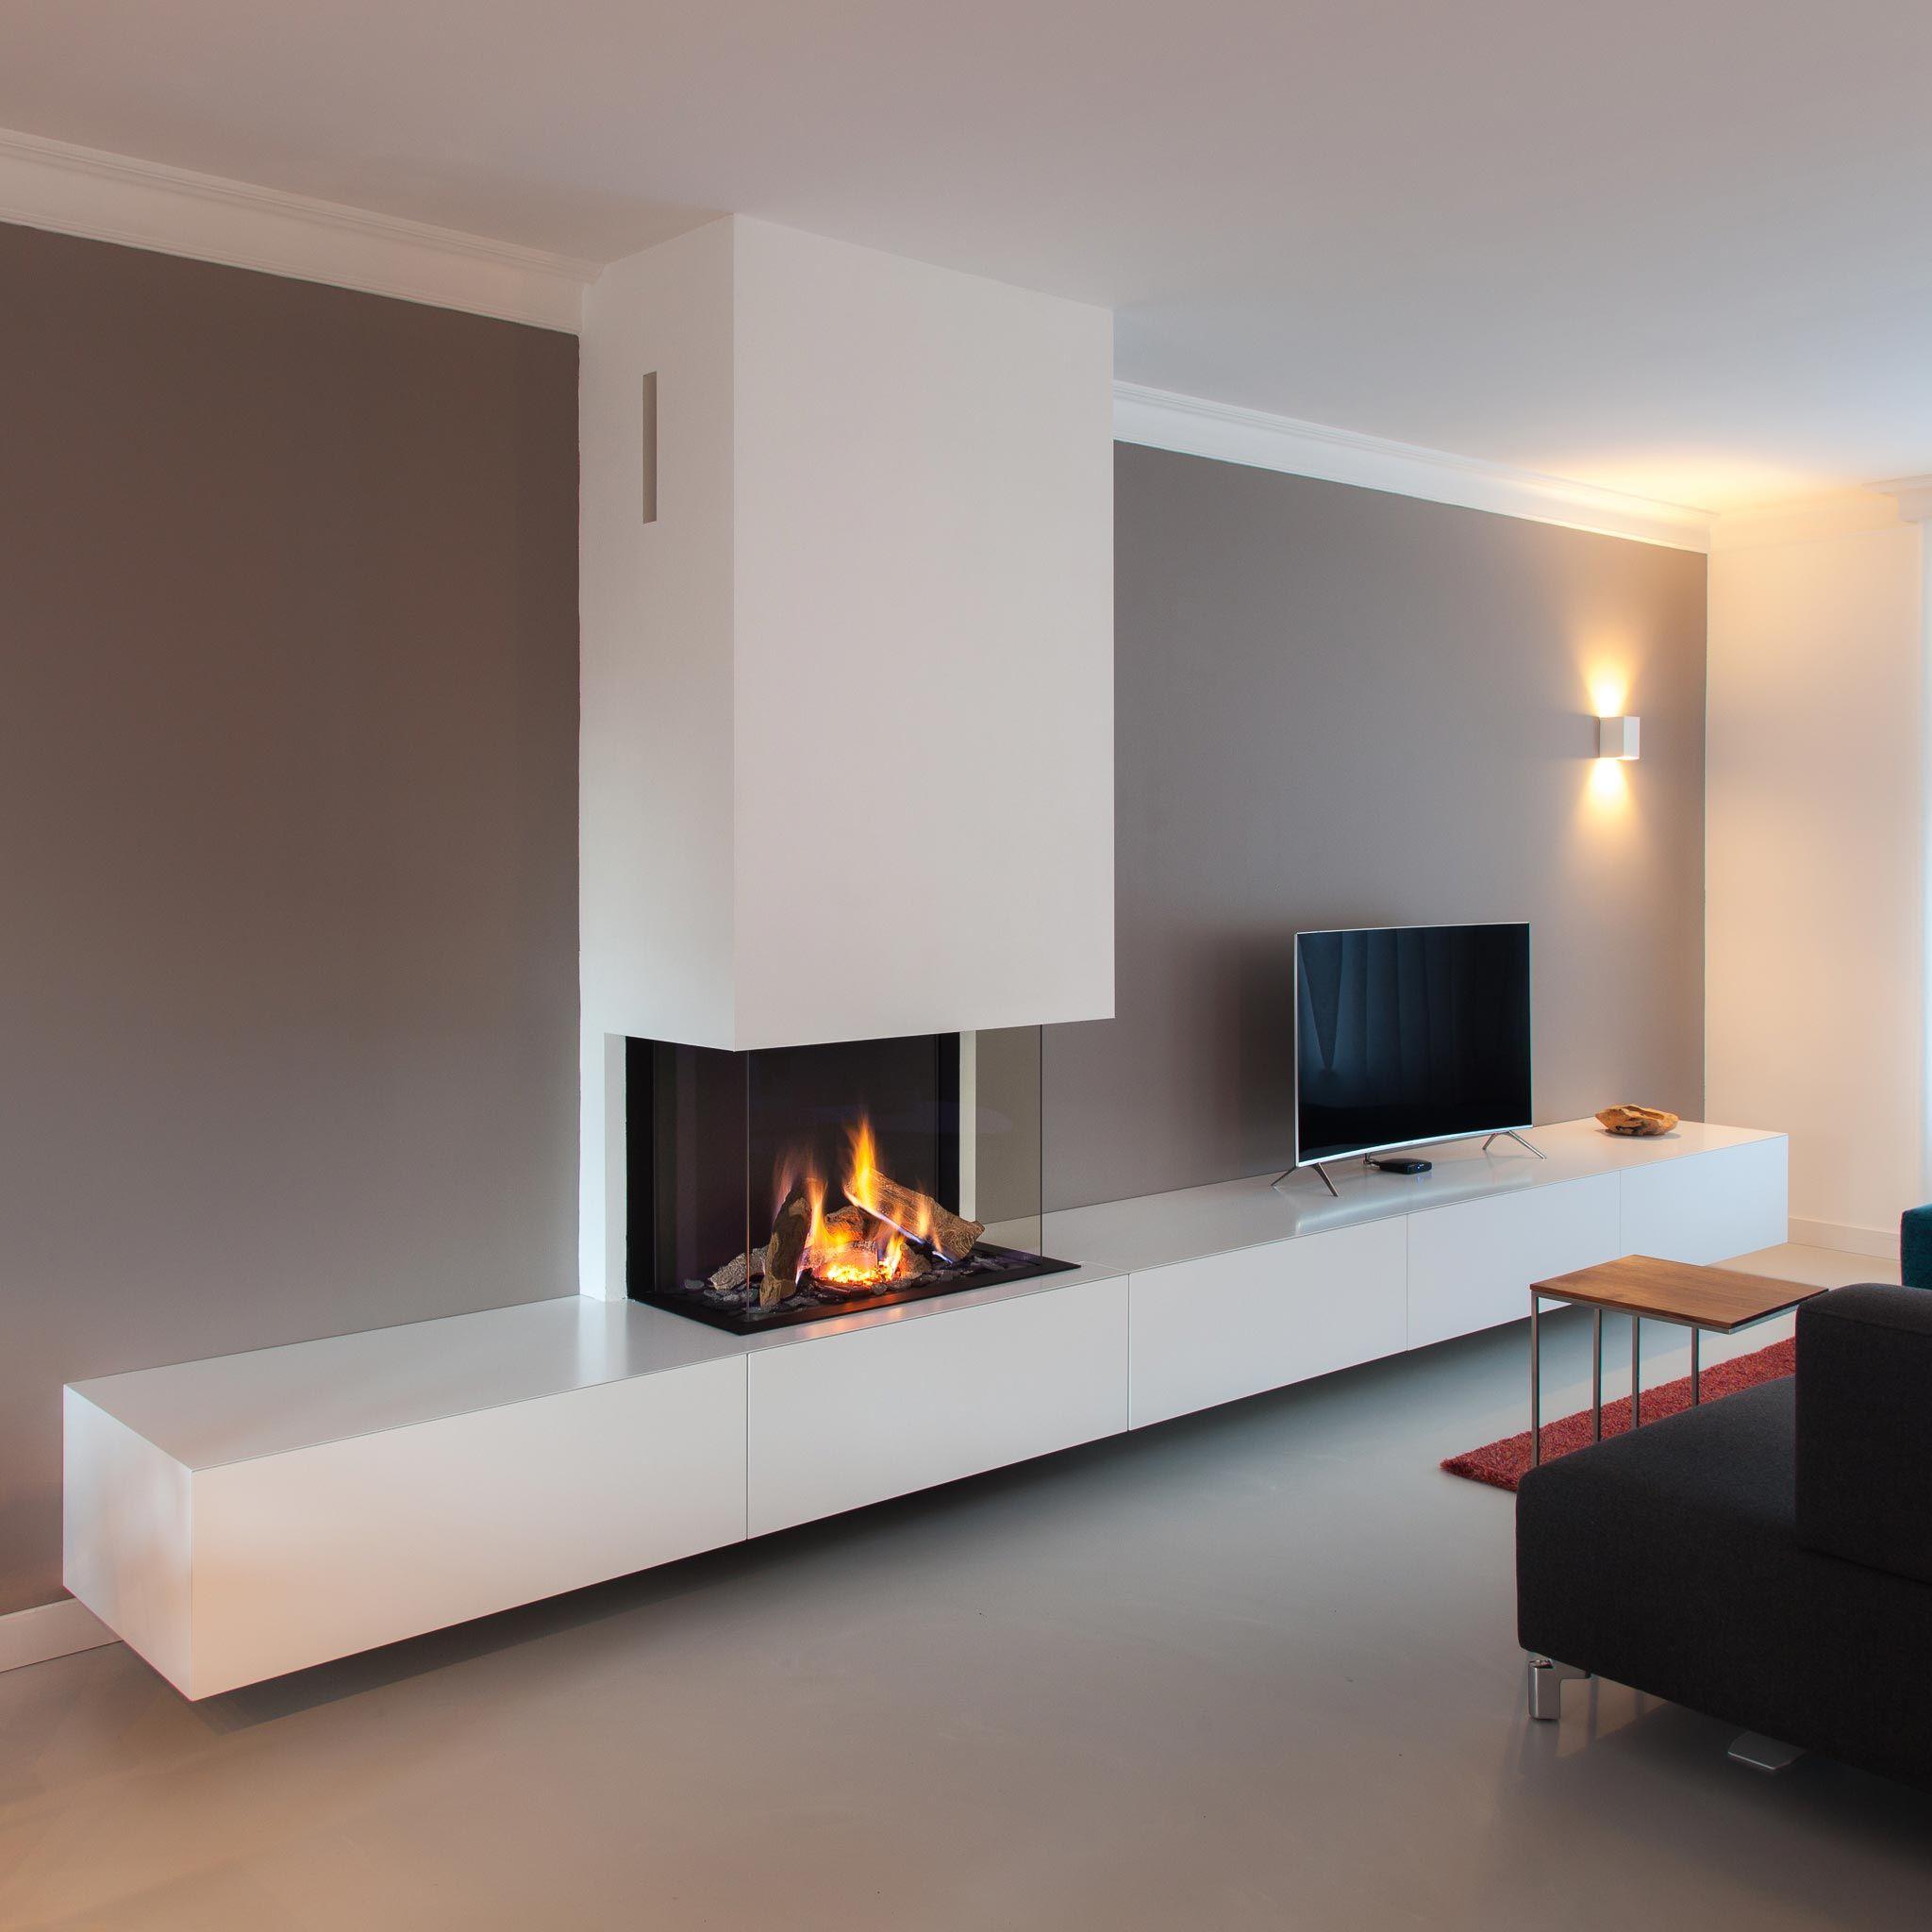 Salones Con Chimenea Y Television Modernos Stunning